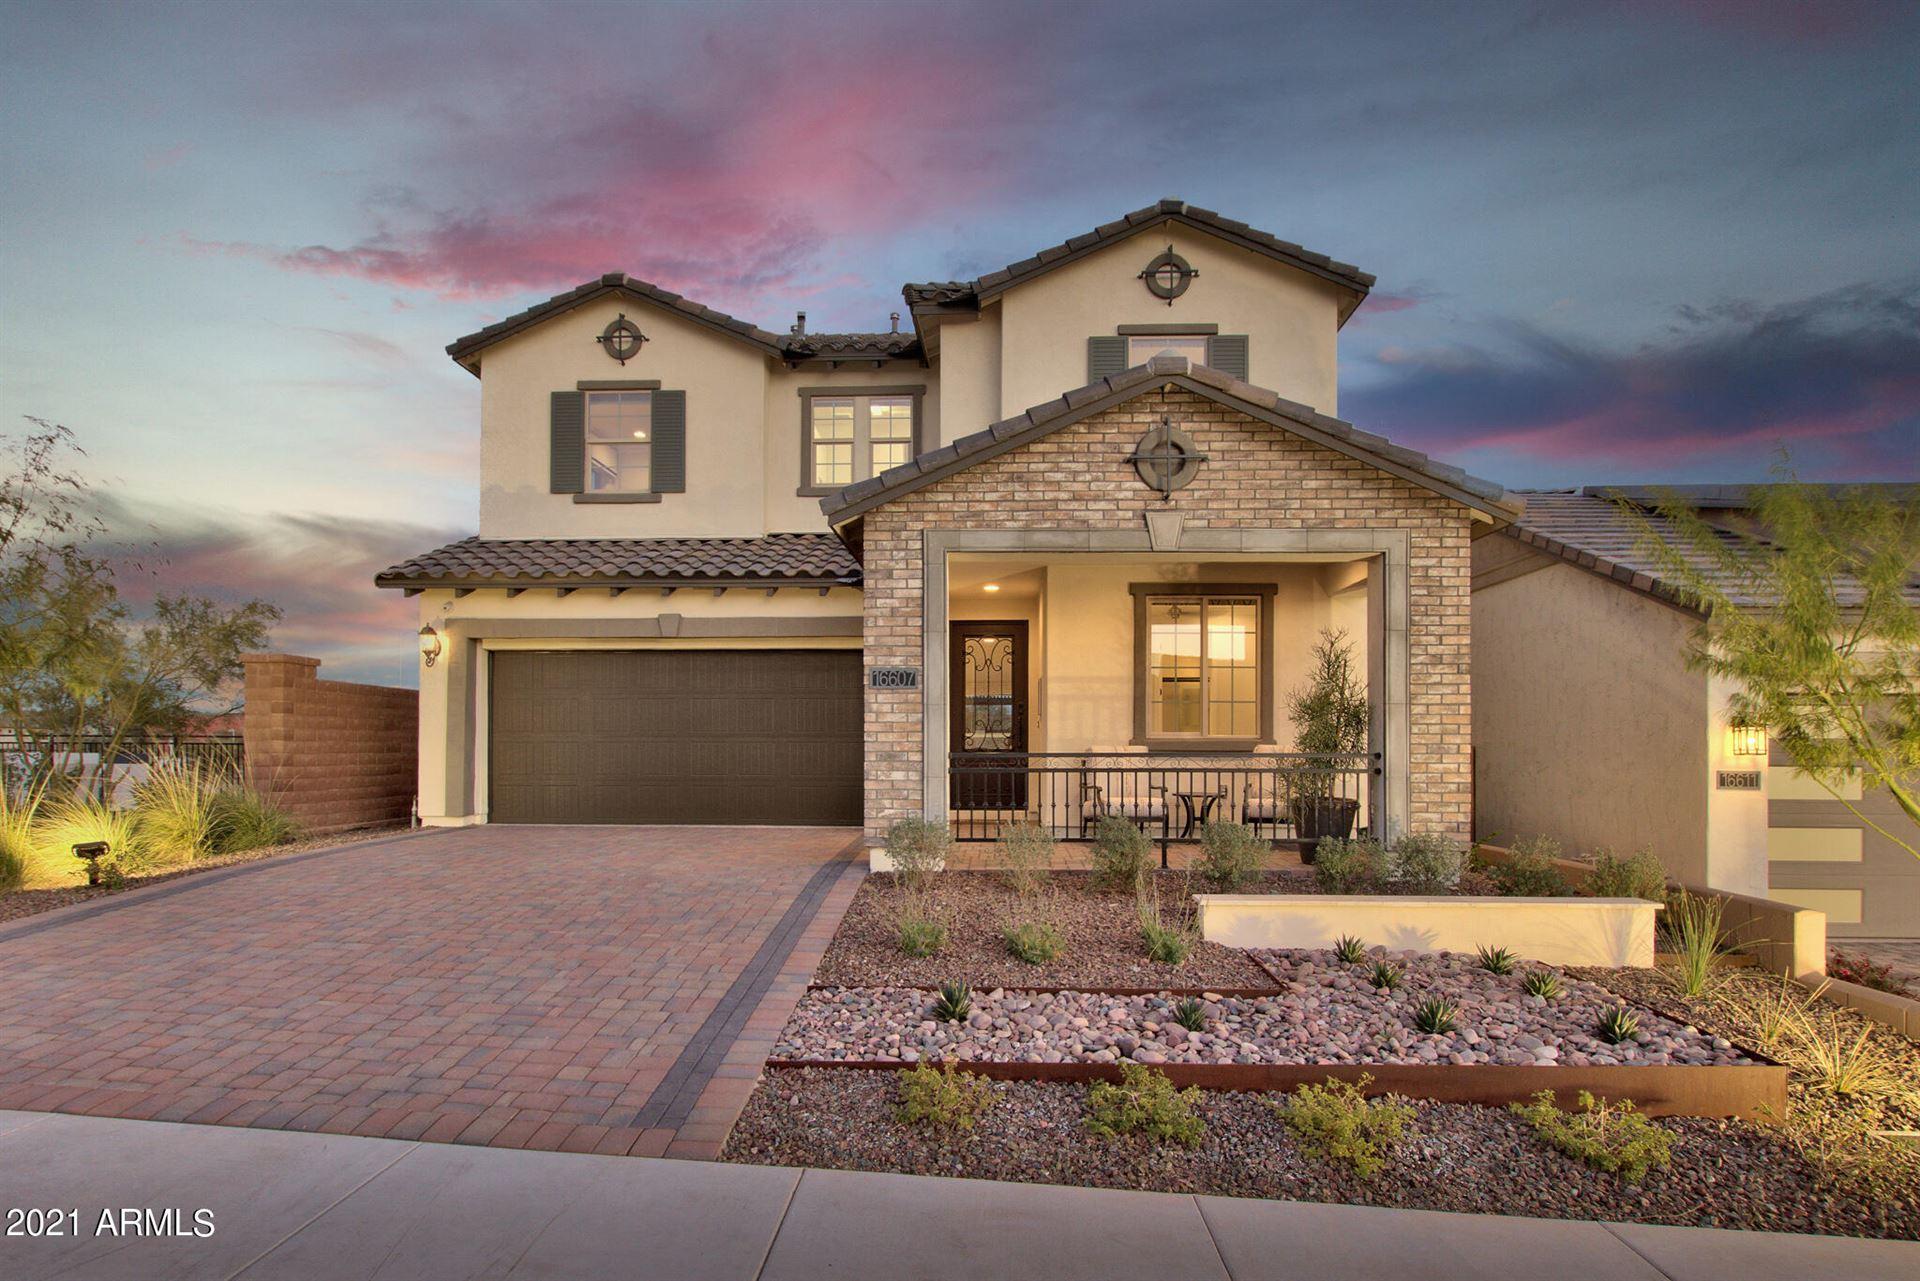 838 E DEER CREEK Road, Phoenix, AZ 85048 - MLS#: 6302718